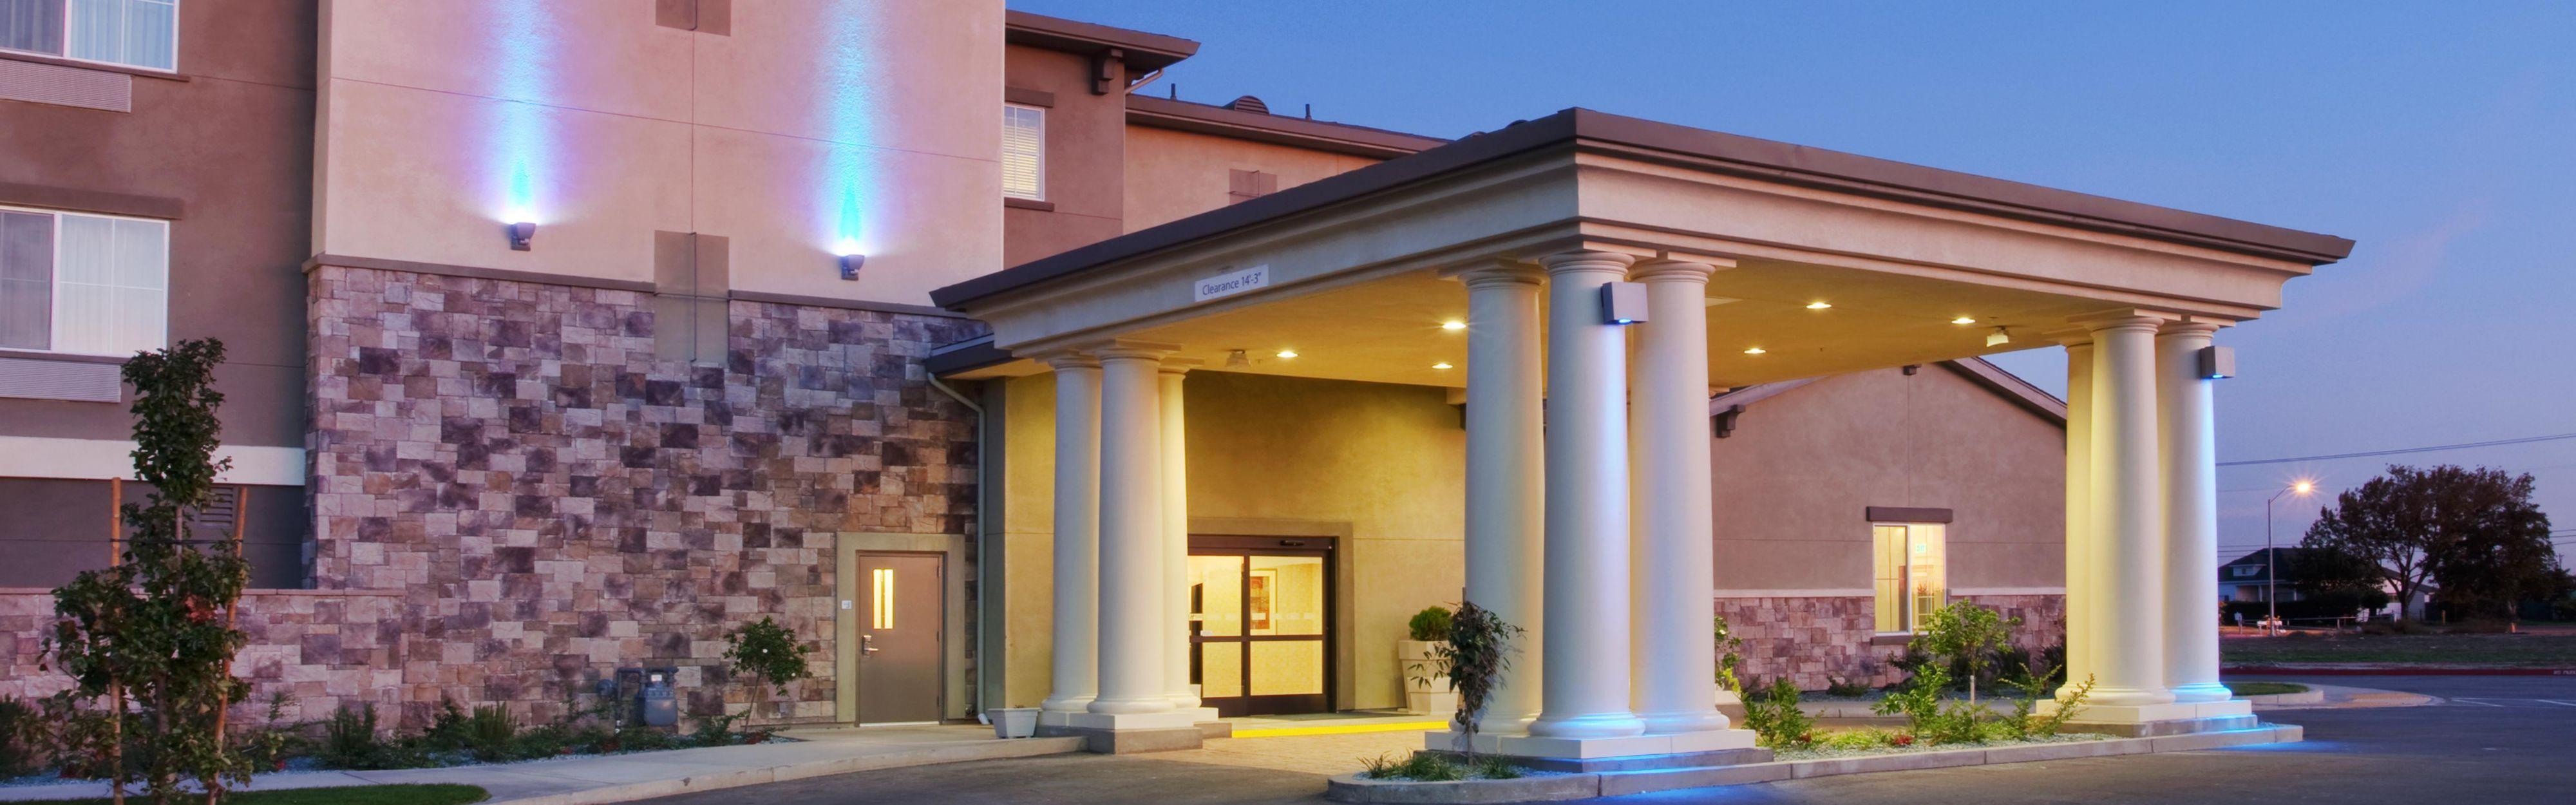 Holiday Inn Express Lodi  Lodi California  Ca